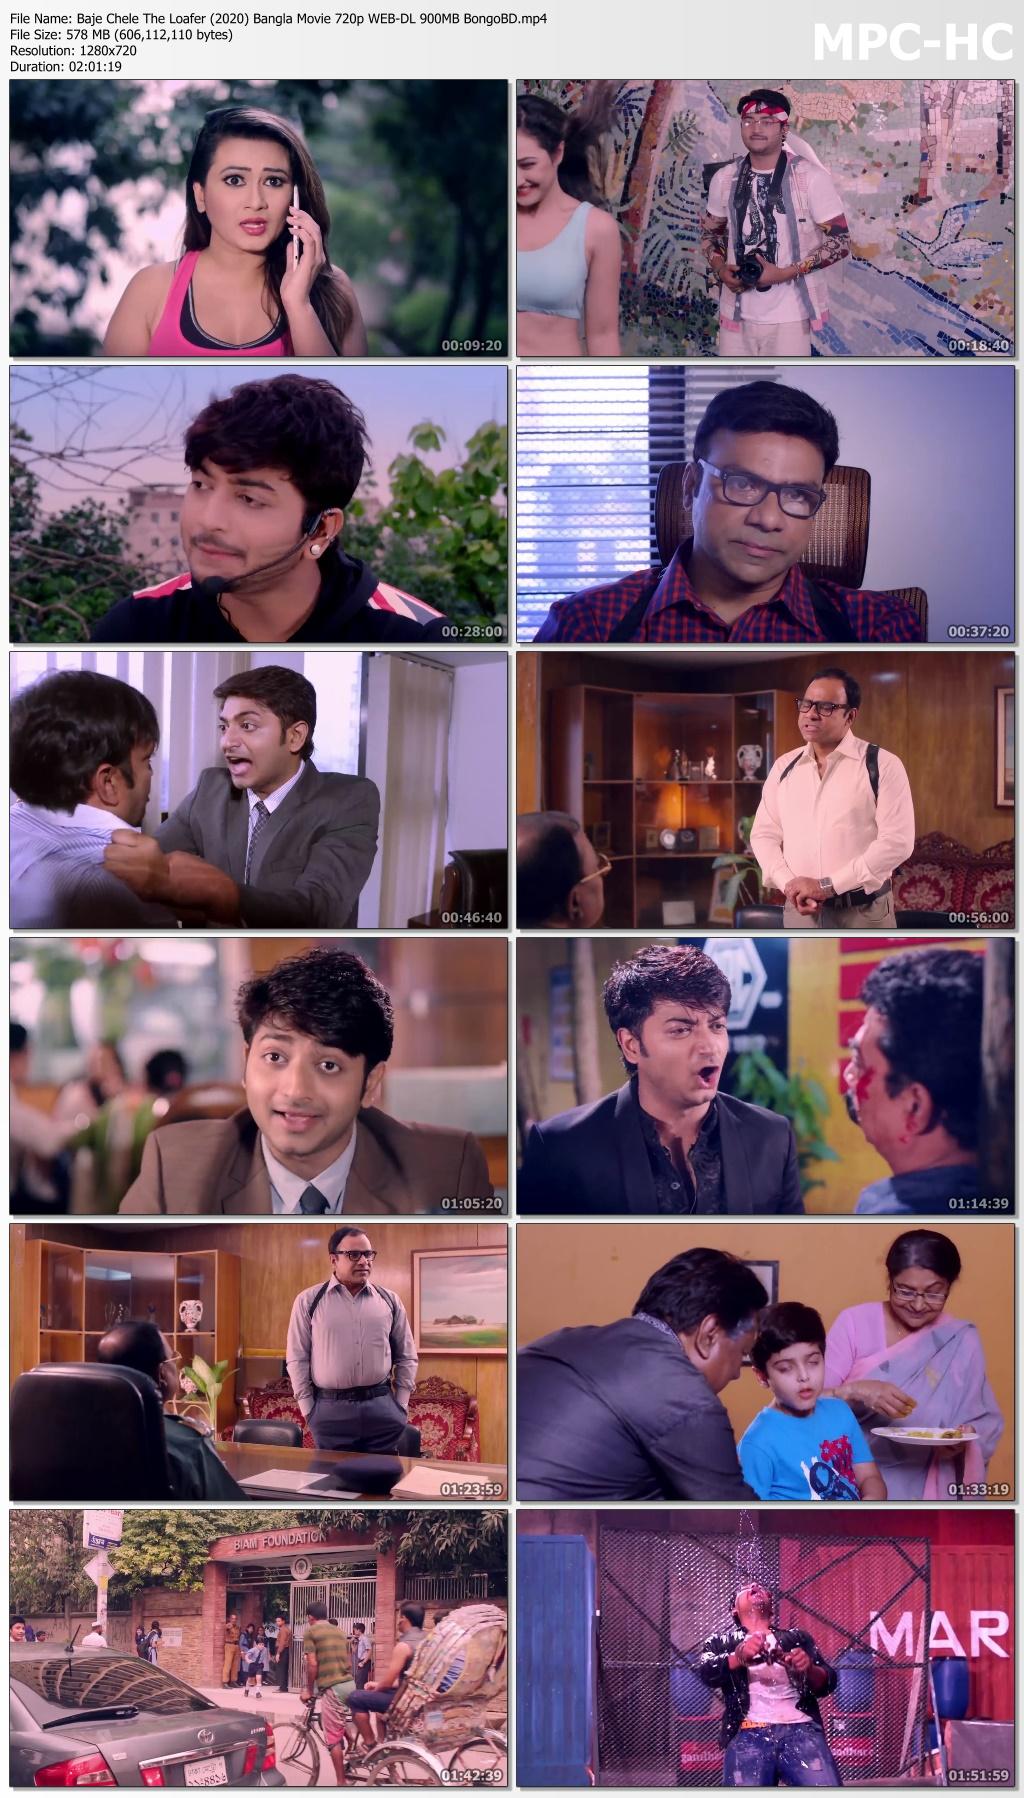 Baje-Chele-The-Loafer-2020-Bangla-Movie-720p-WEB-DL-900-MB-Bongo-BD-mp4-thumbs